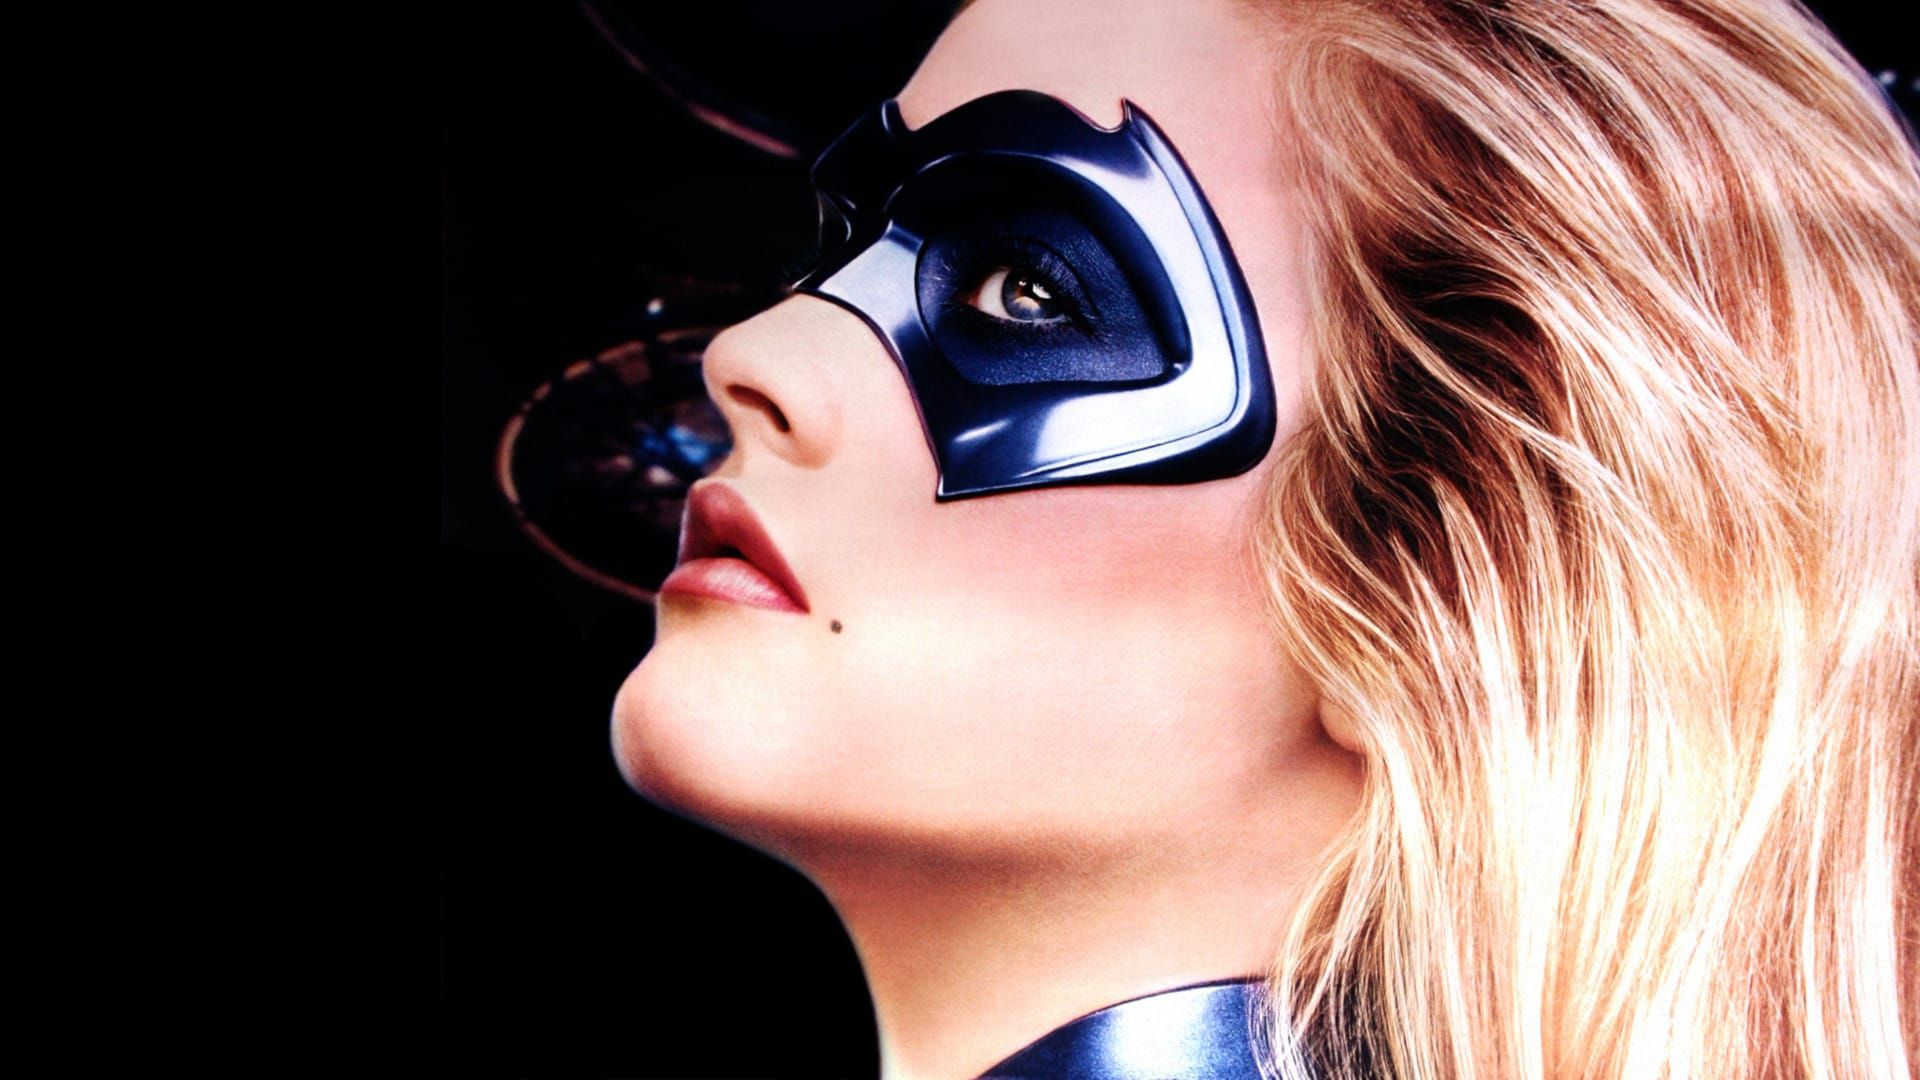 Batman 1997 Streaming Ita Cb01 Film Completo Cinema Guarda Batman Italiano 1997 Film Stre Free Movies Online Full Movies Online Full Movies Online Free